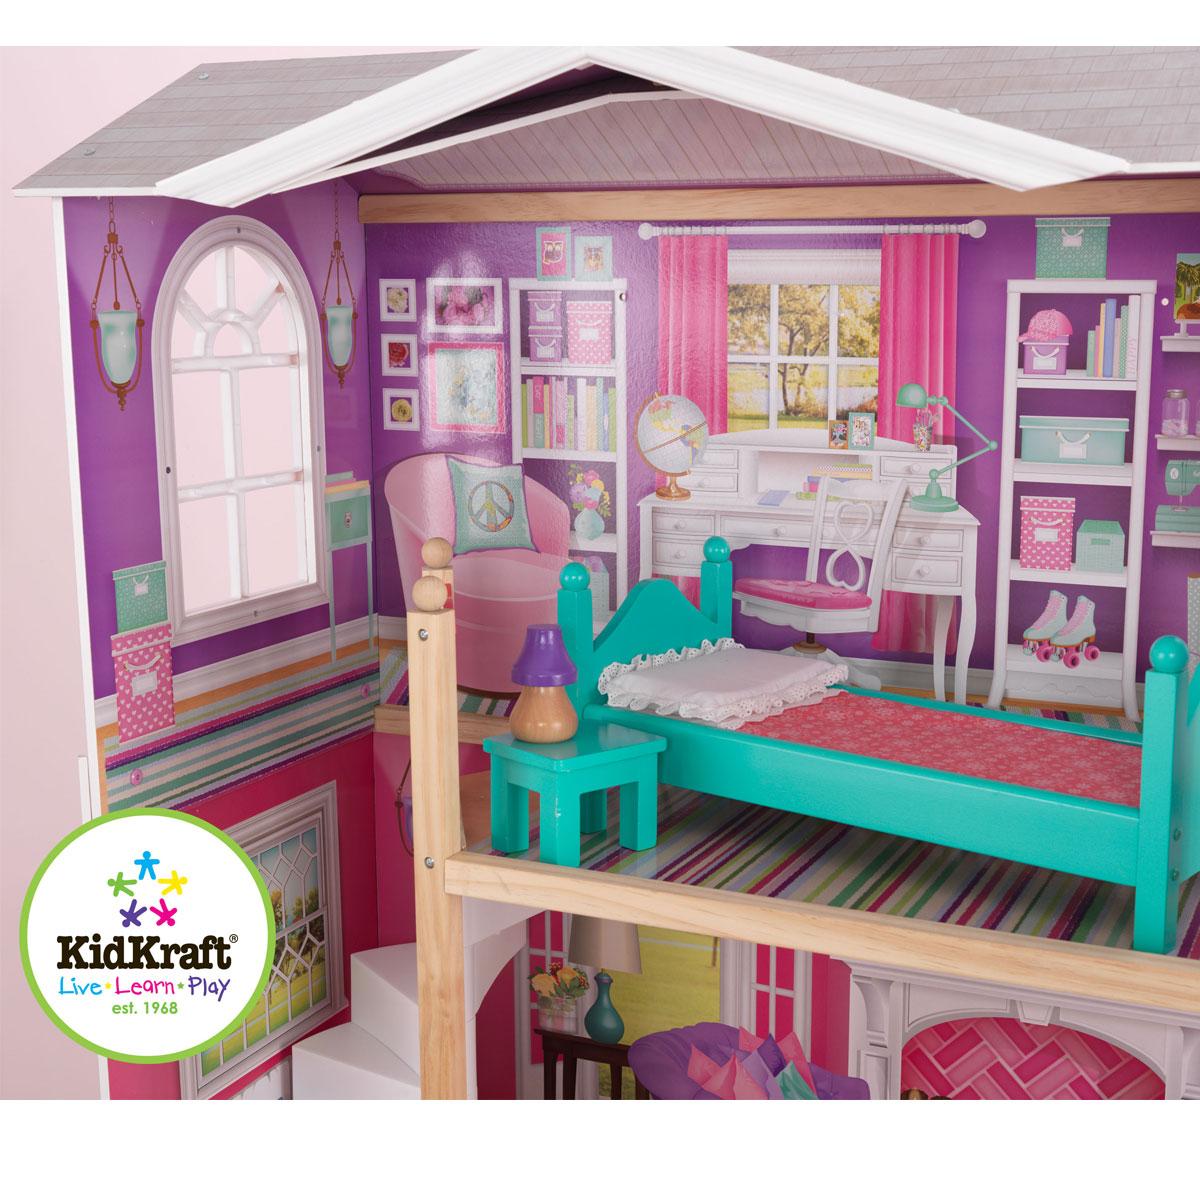 kidkraft puppenhaus aus holz elegantes herrenhaus 65830. Black Bedroom Furniture Sets. Home Design Ideas